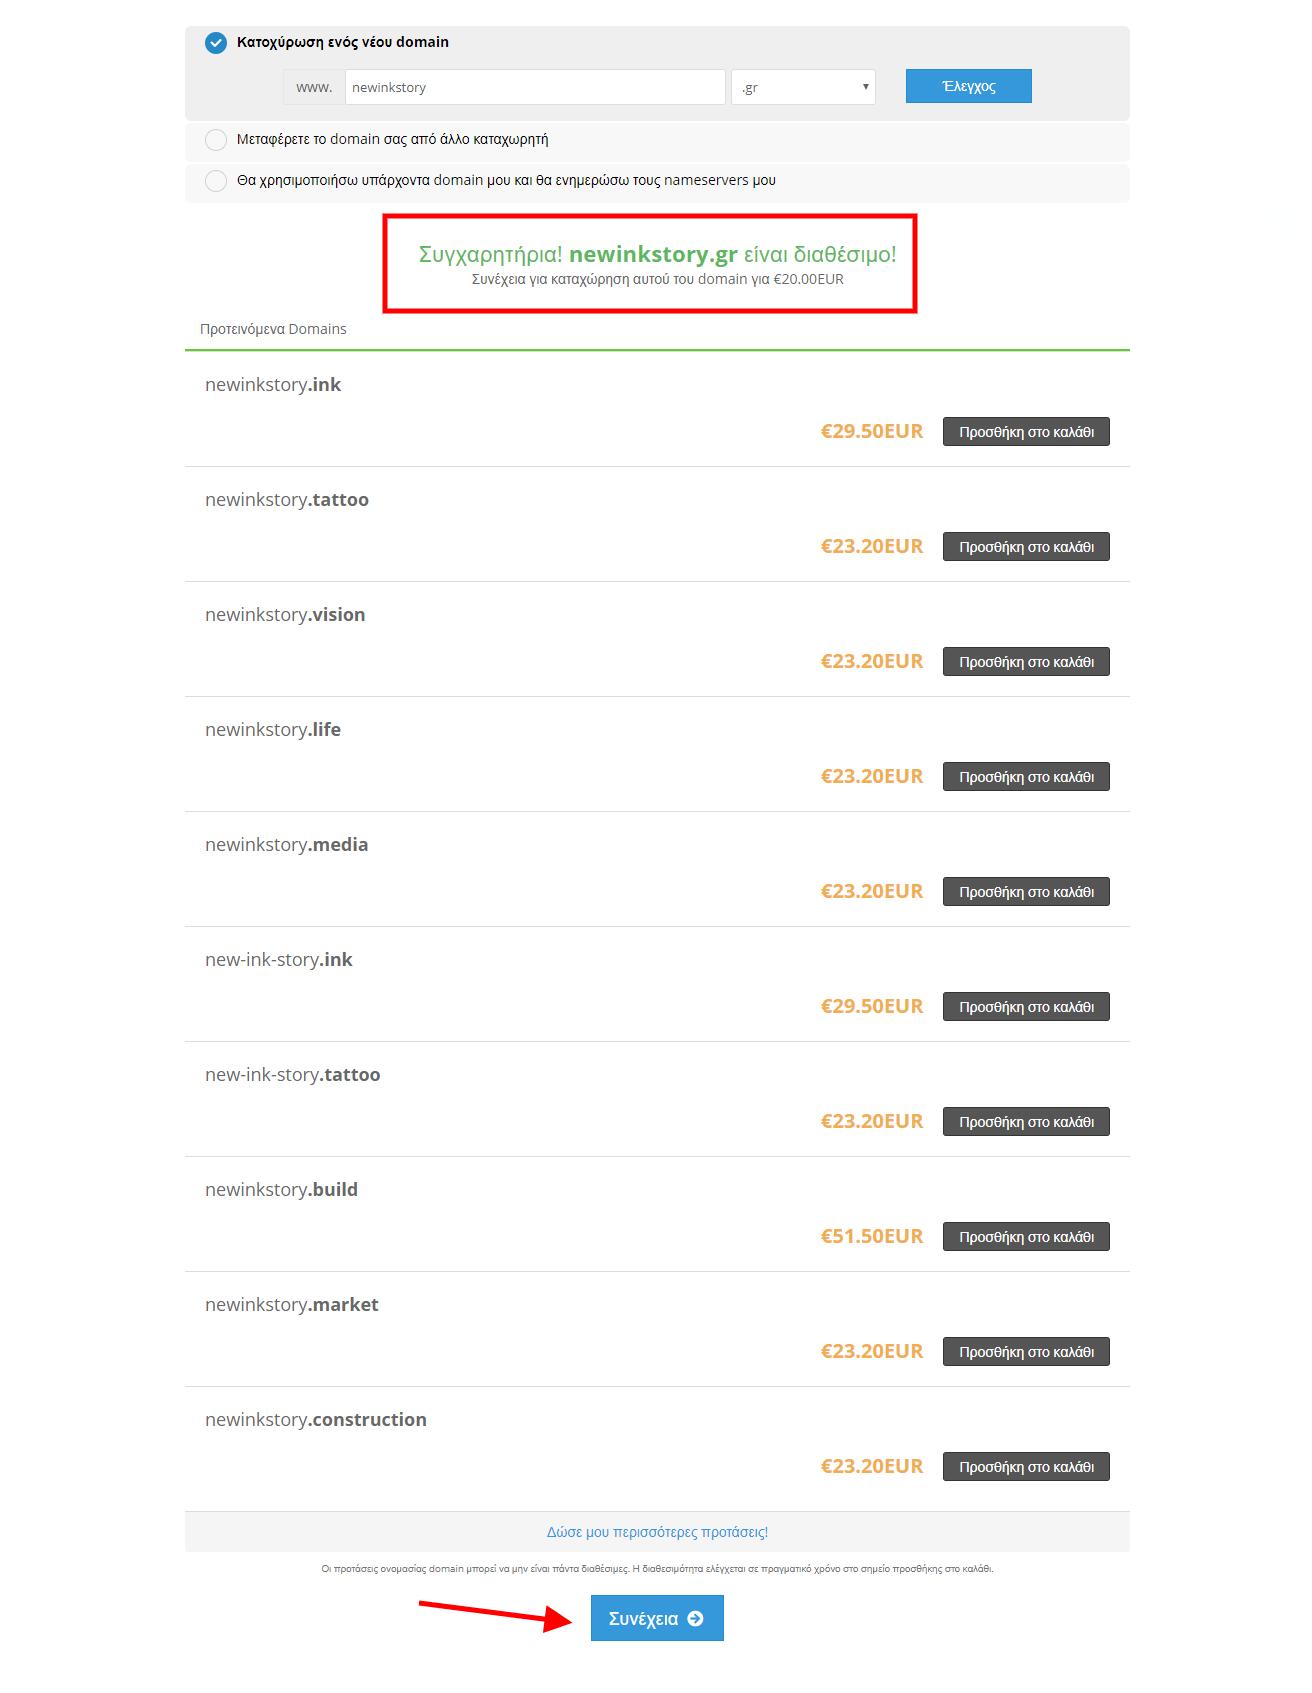 GreekHost - Έλεγχος διαθεσιμότητας domain name